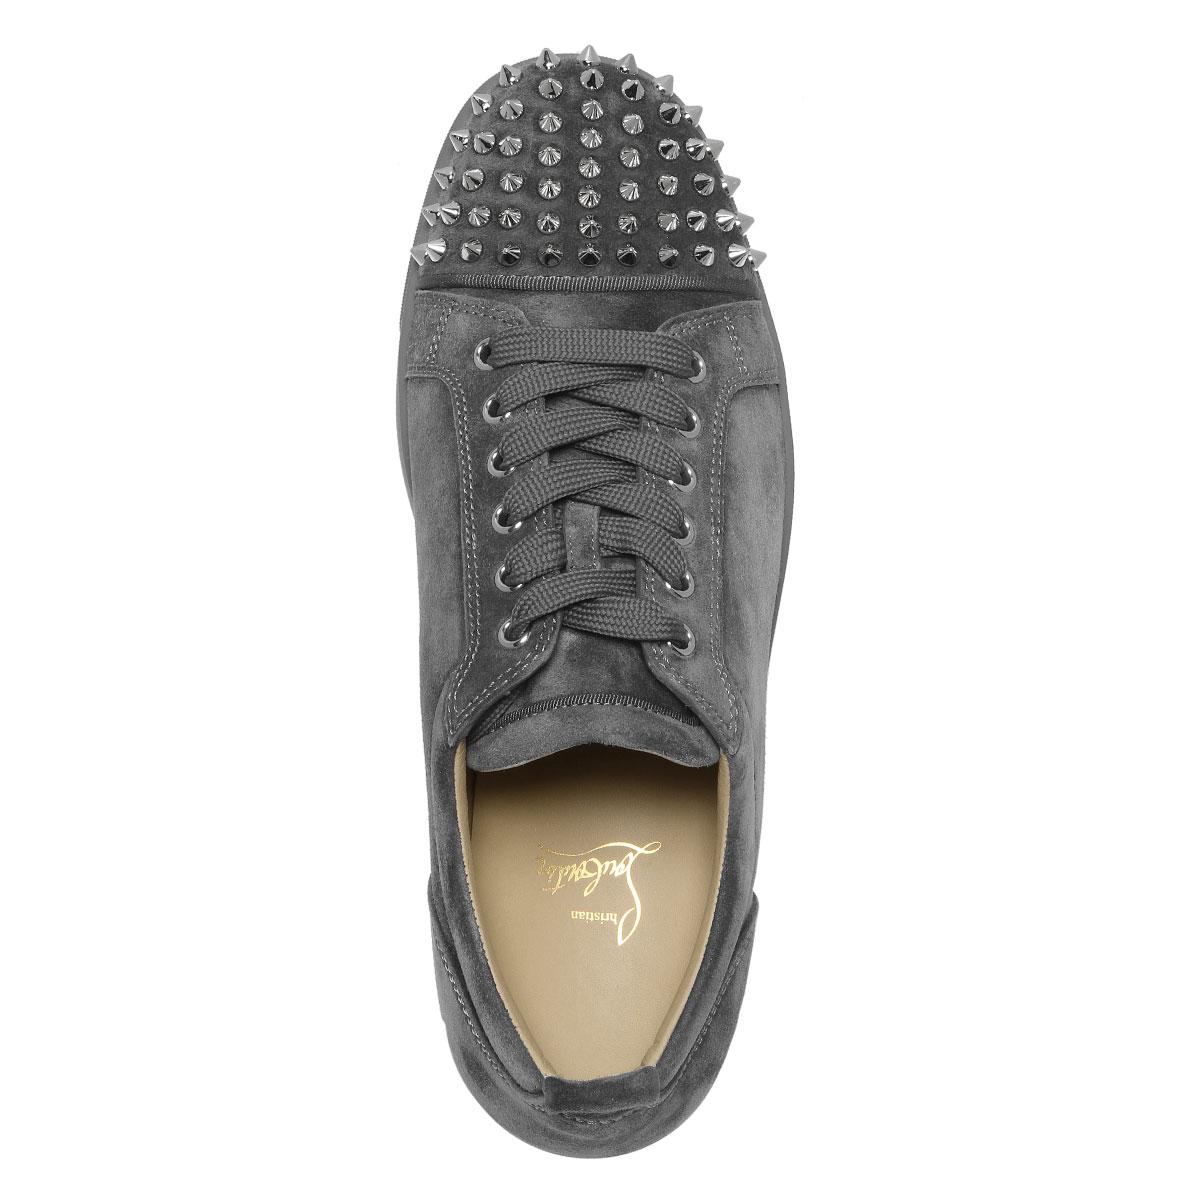 cae8b139397 1180051 クリスチャンルブタン Christian Louboutin shoes men I208 sneakers LOUIS JUNIOR  SPIKES FLAT Lewis Junius pike staple fiber rat SHADOW/SV gray